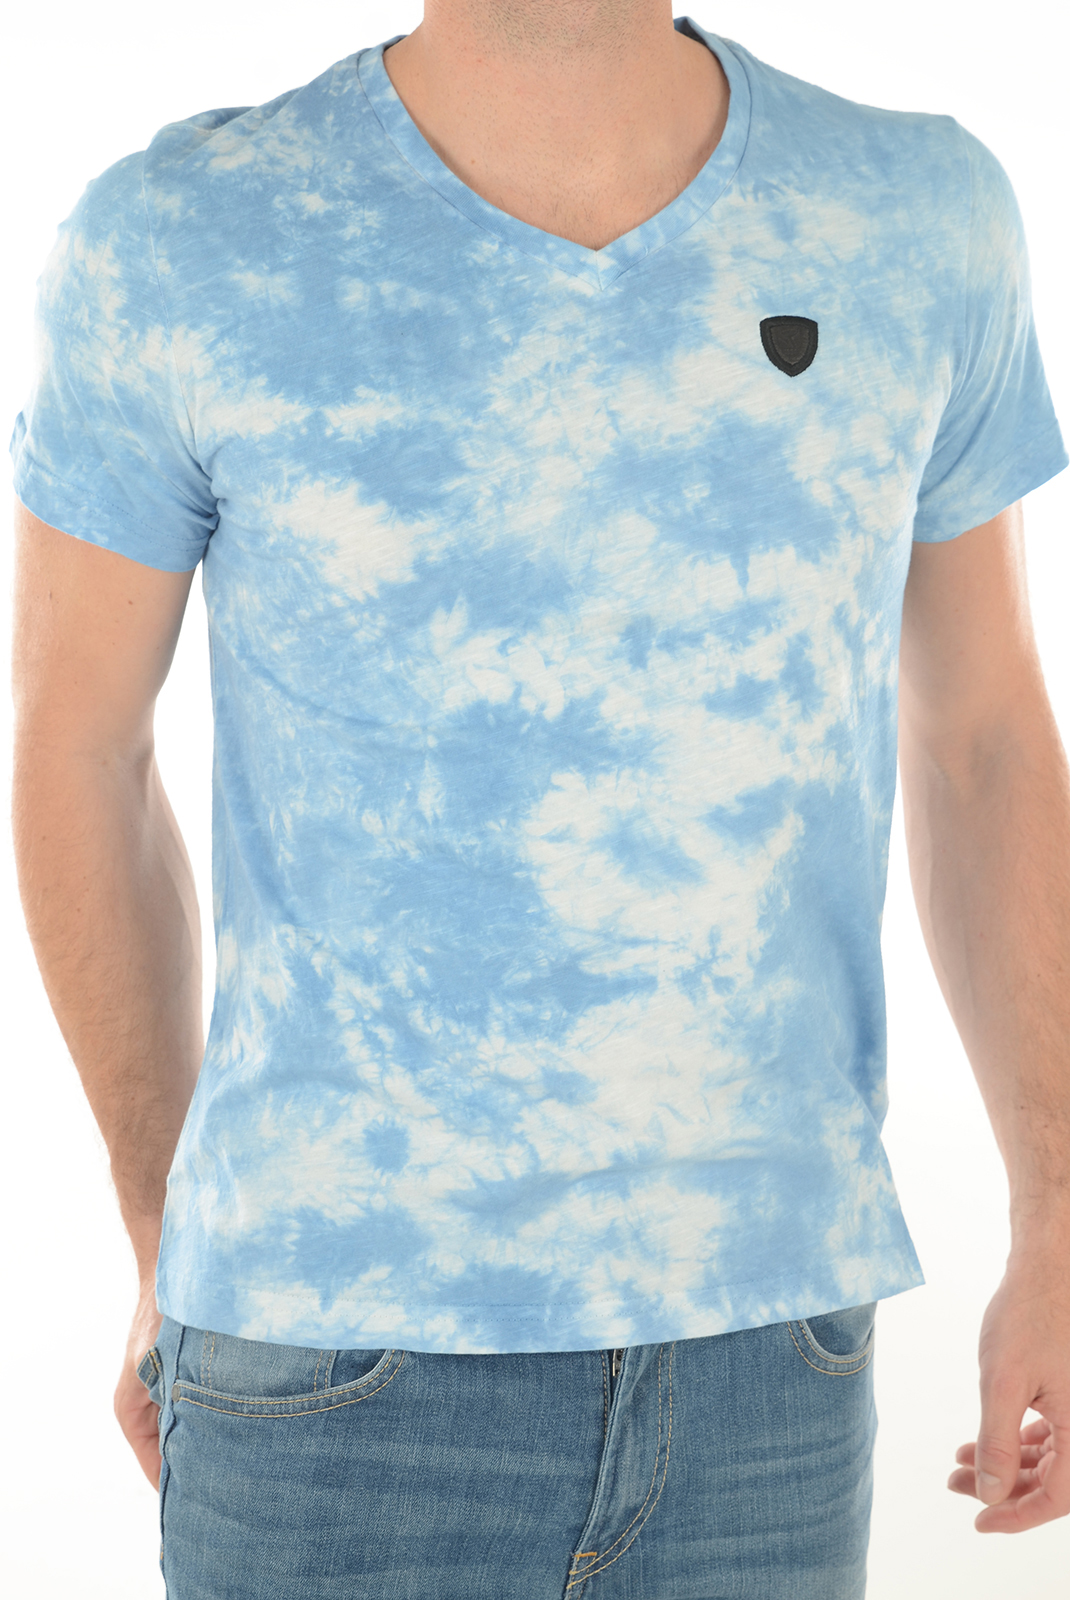 Tee-shirts  Redskins WASABI RALLY DAZZLING BLUE